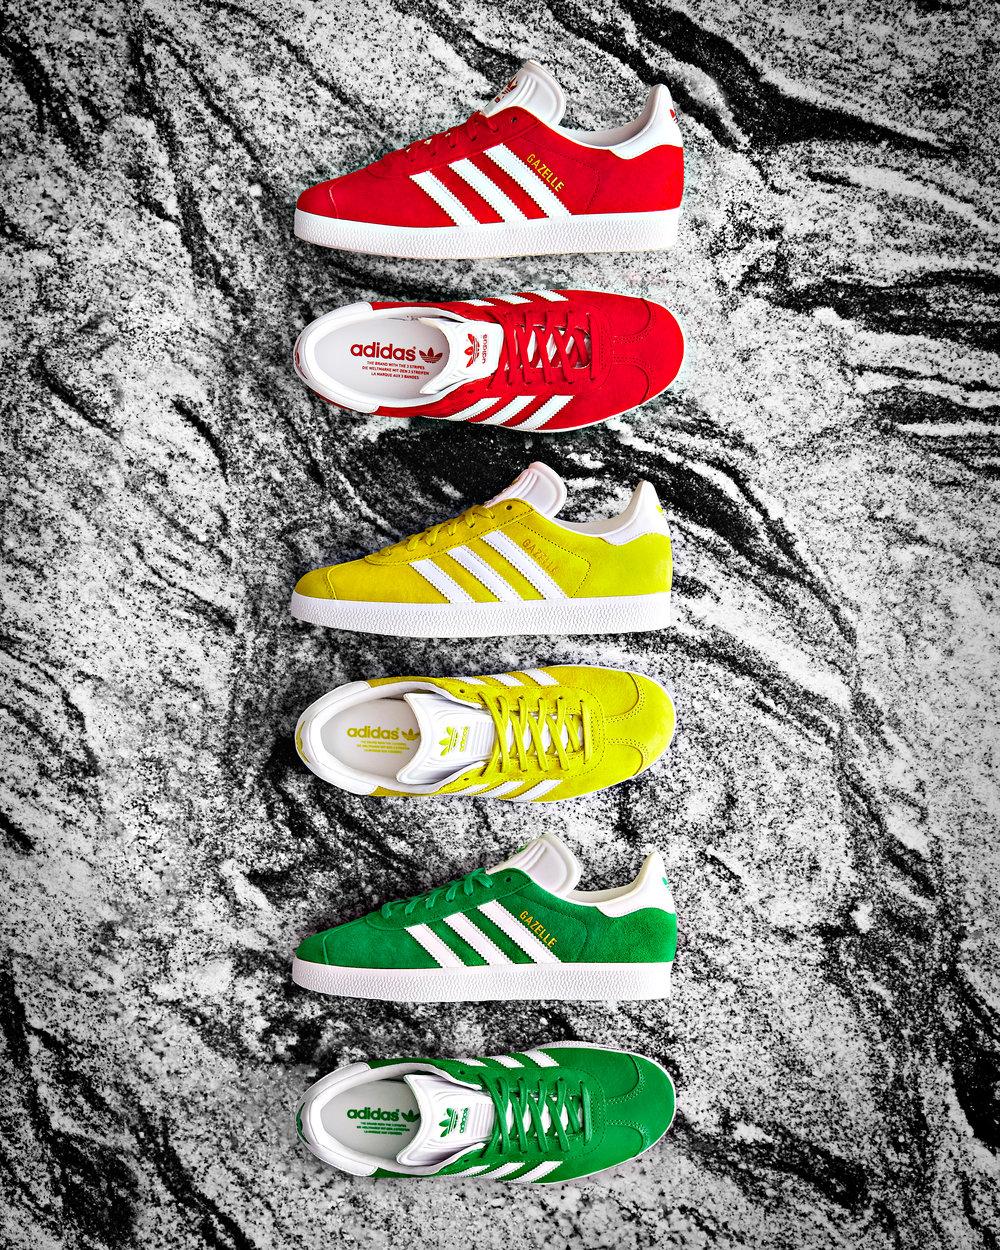 3_Adidas_Granite_retouched2.jpg